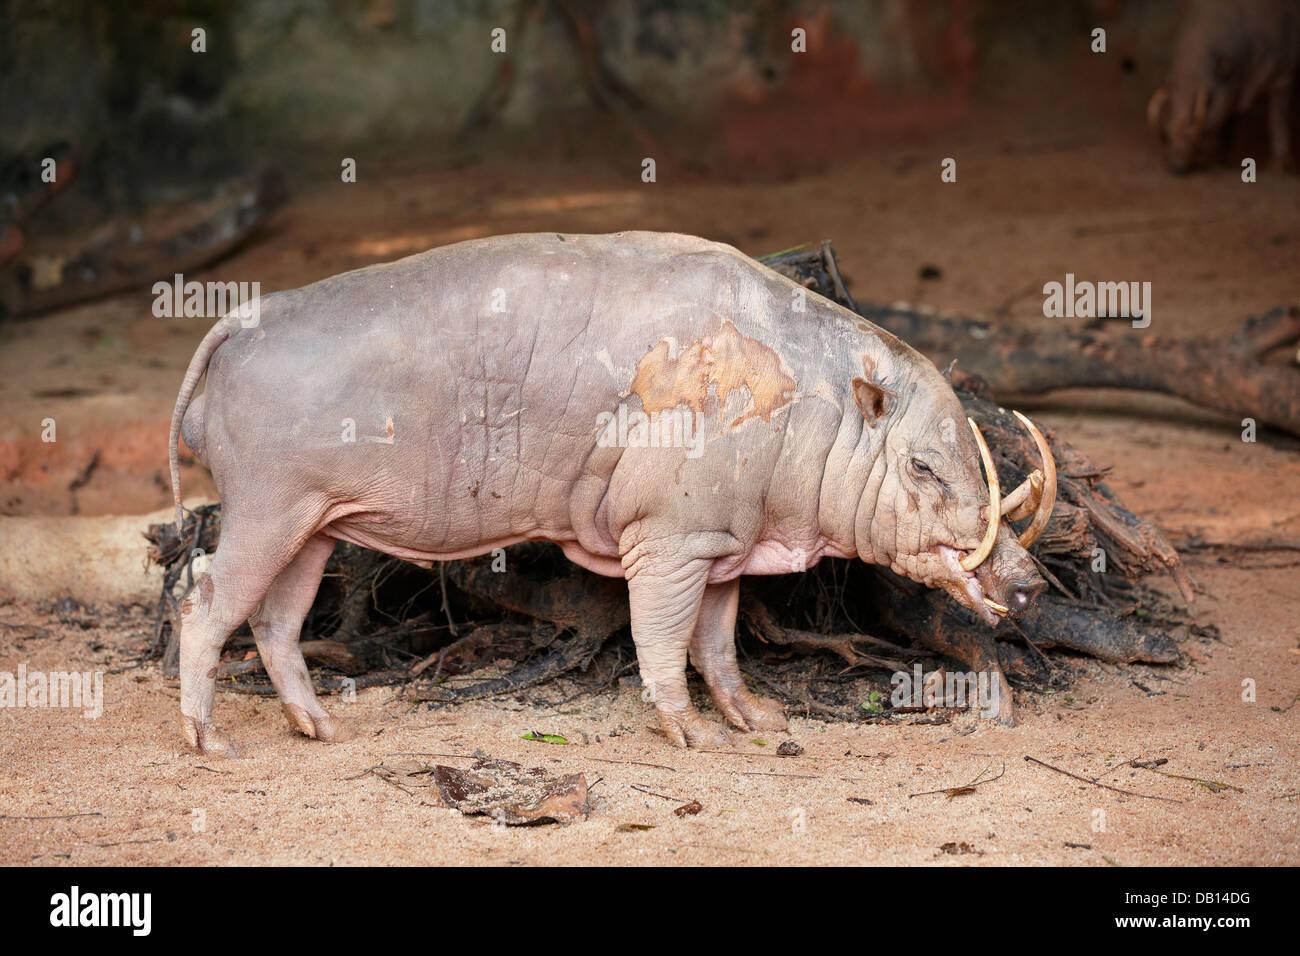 Adult Male Of North Sulawesi Babirusa In Singapore Zoo Scientific Stock Photo Alamy